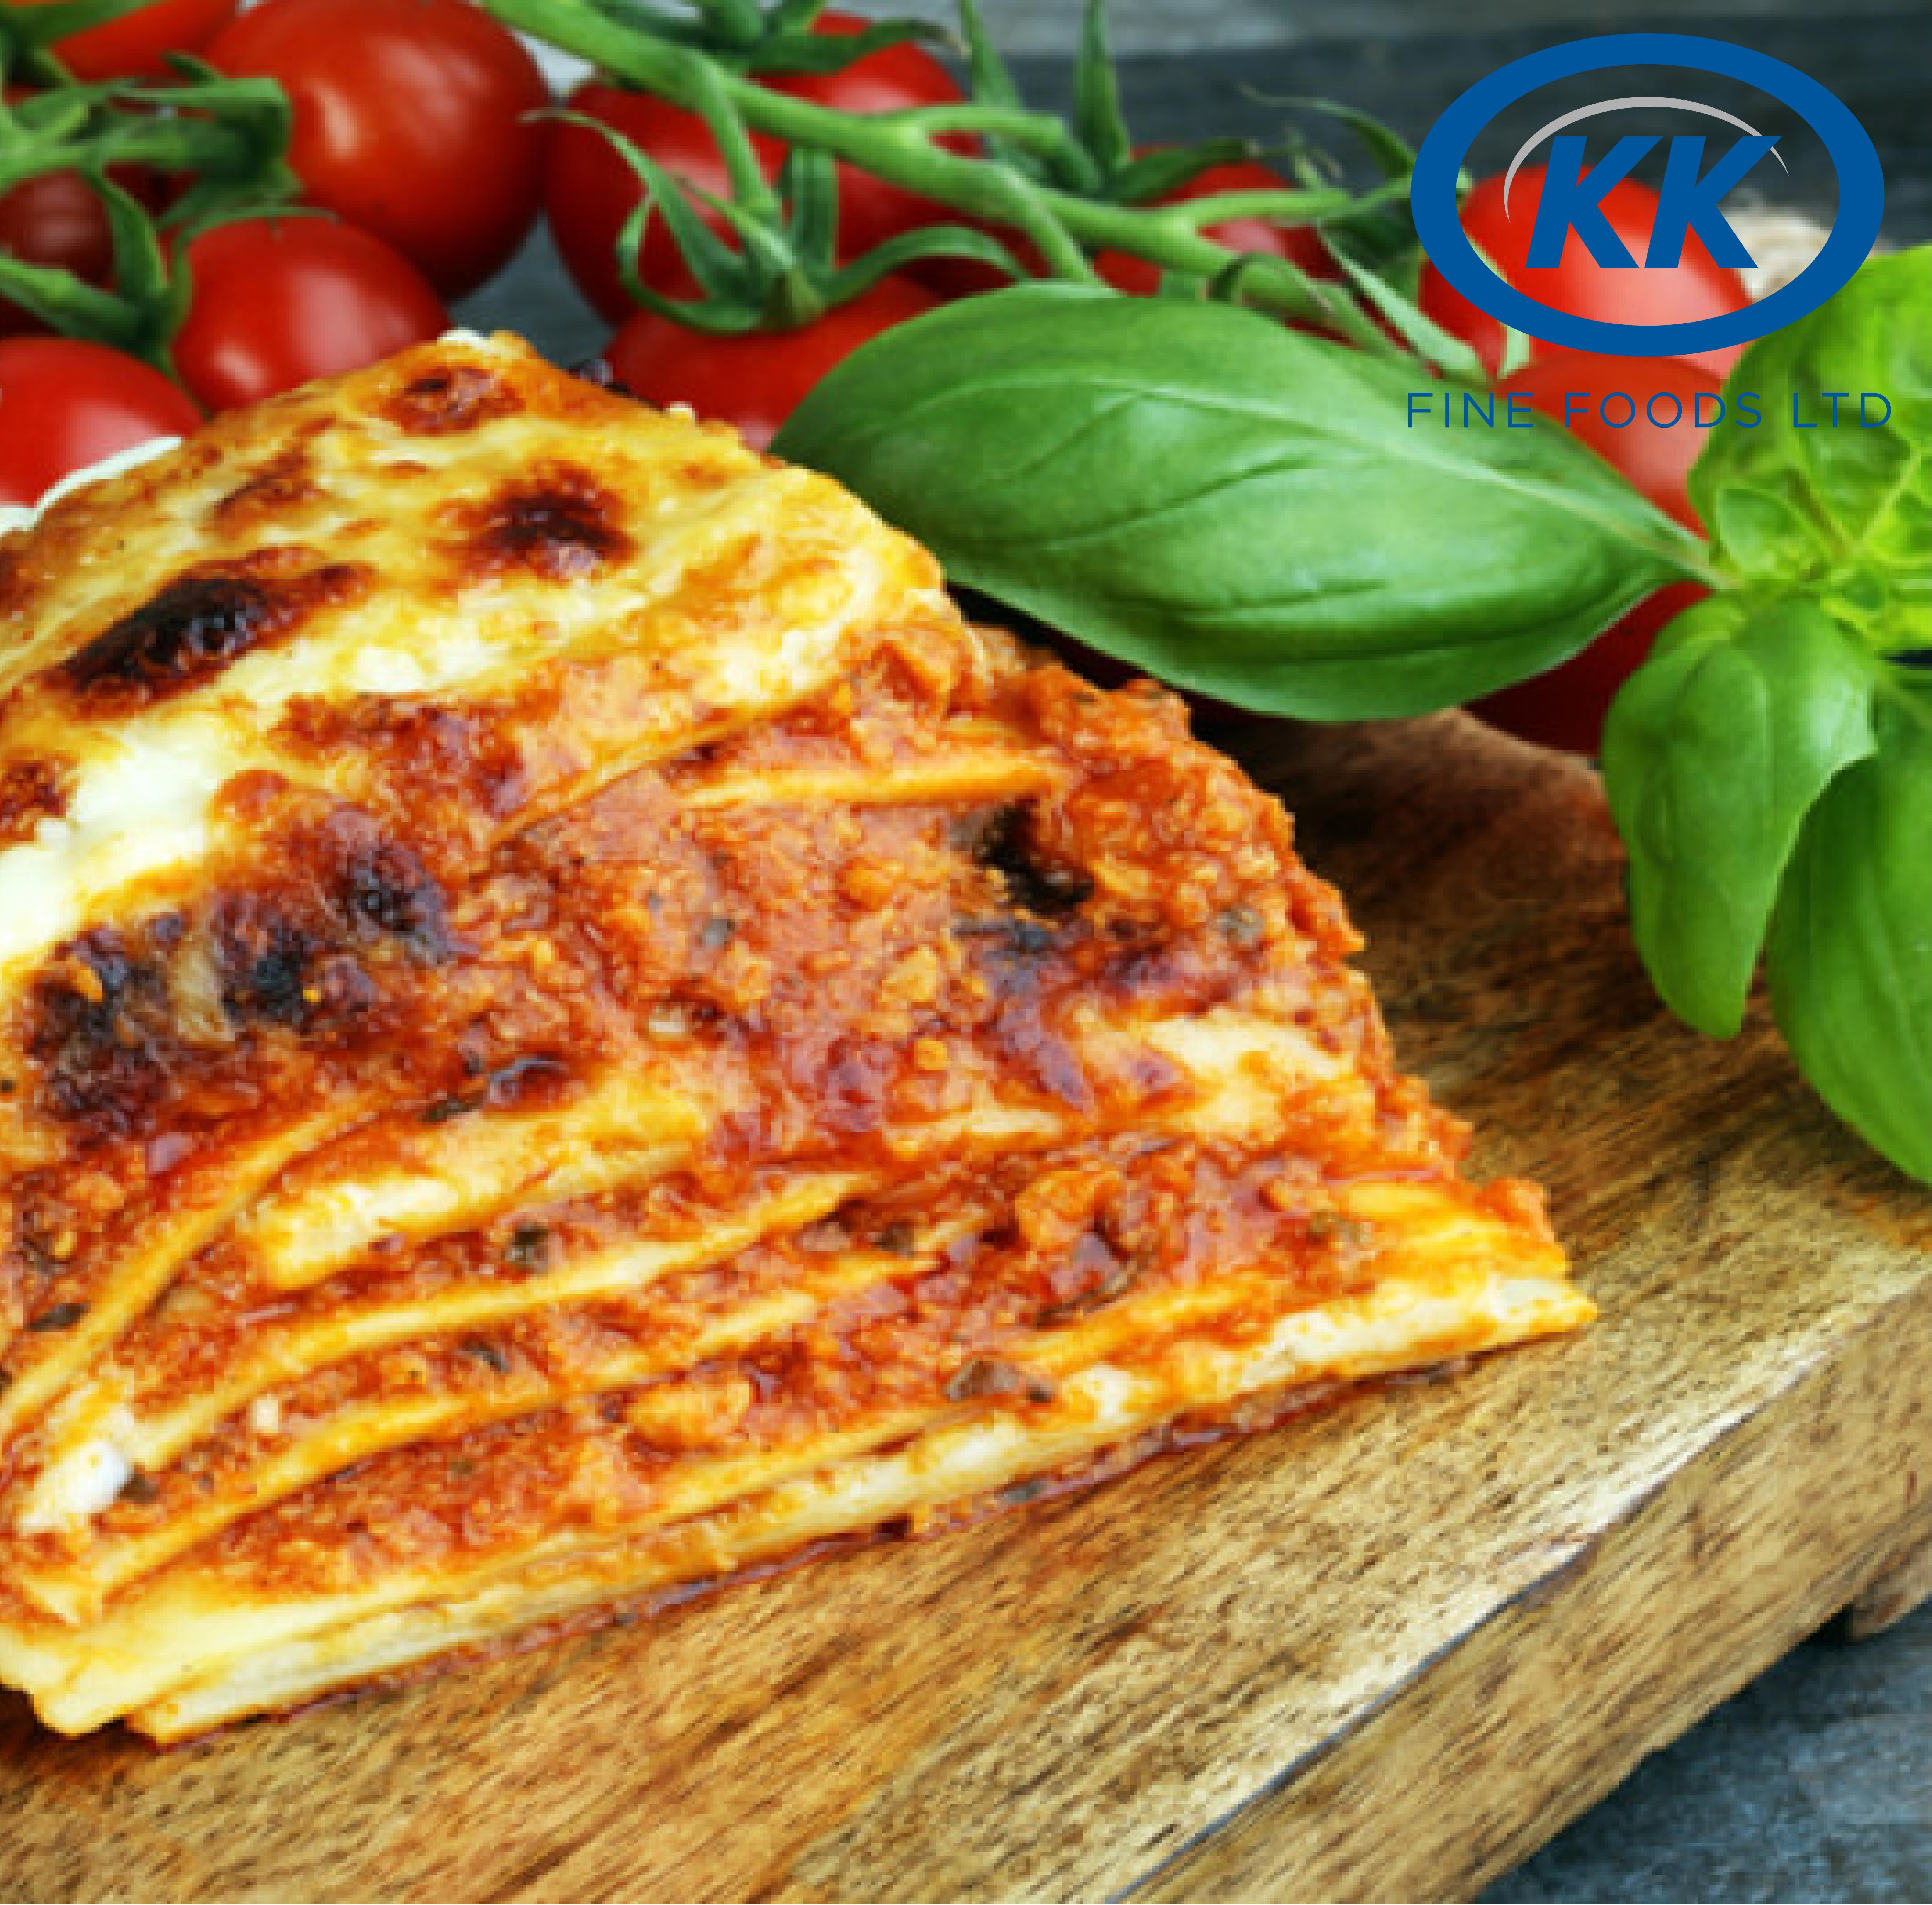 K.K Fine Foods Lasagne Al Forno 12 x 500g